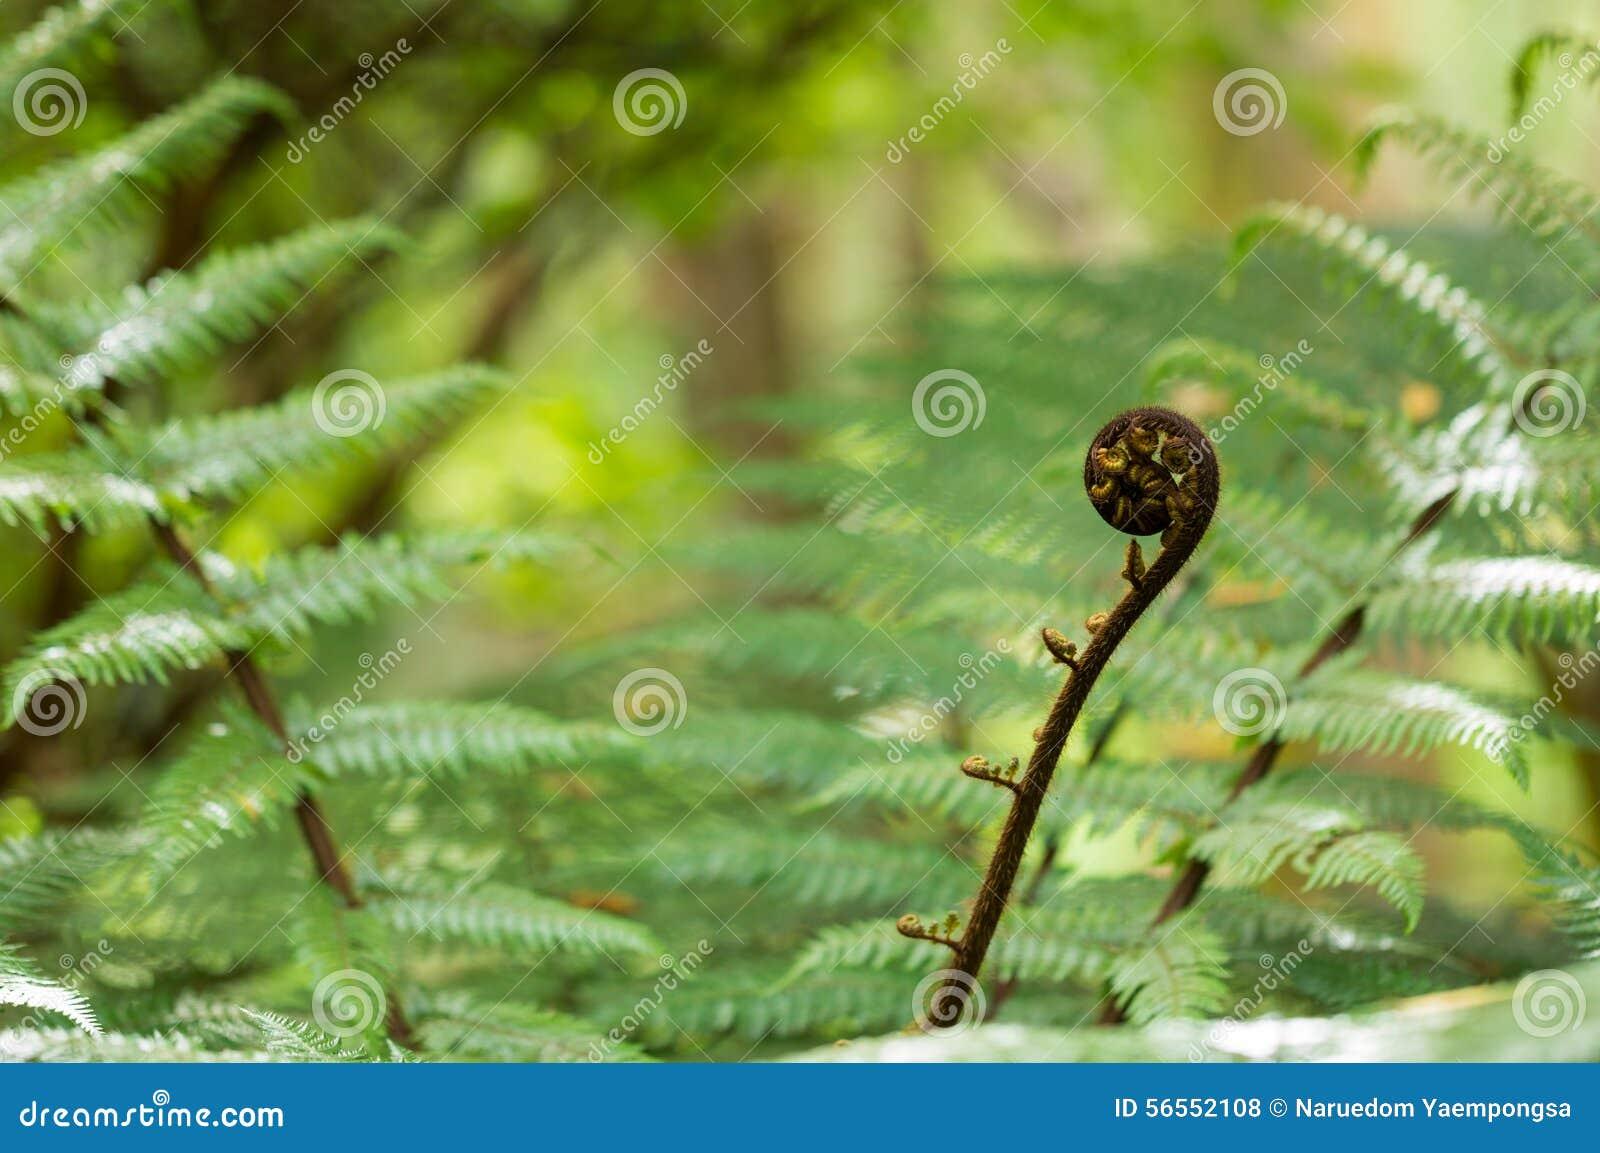 Download Νέο φύλλο της ασημένιας φτέρης της Νέας Ζηλανδίας Στοκ Εικόνες - εικόνα από φυτό, πεδίο: 56552108